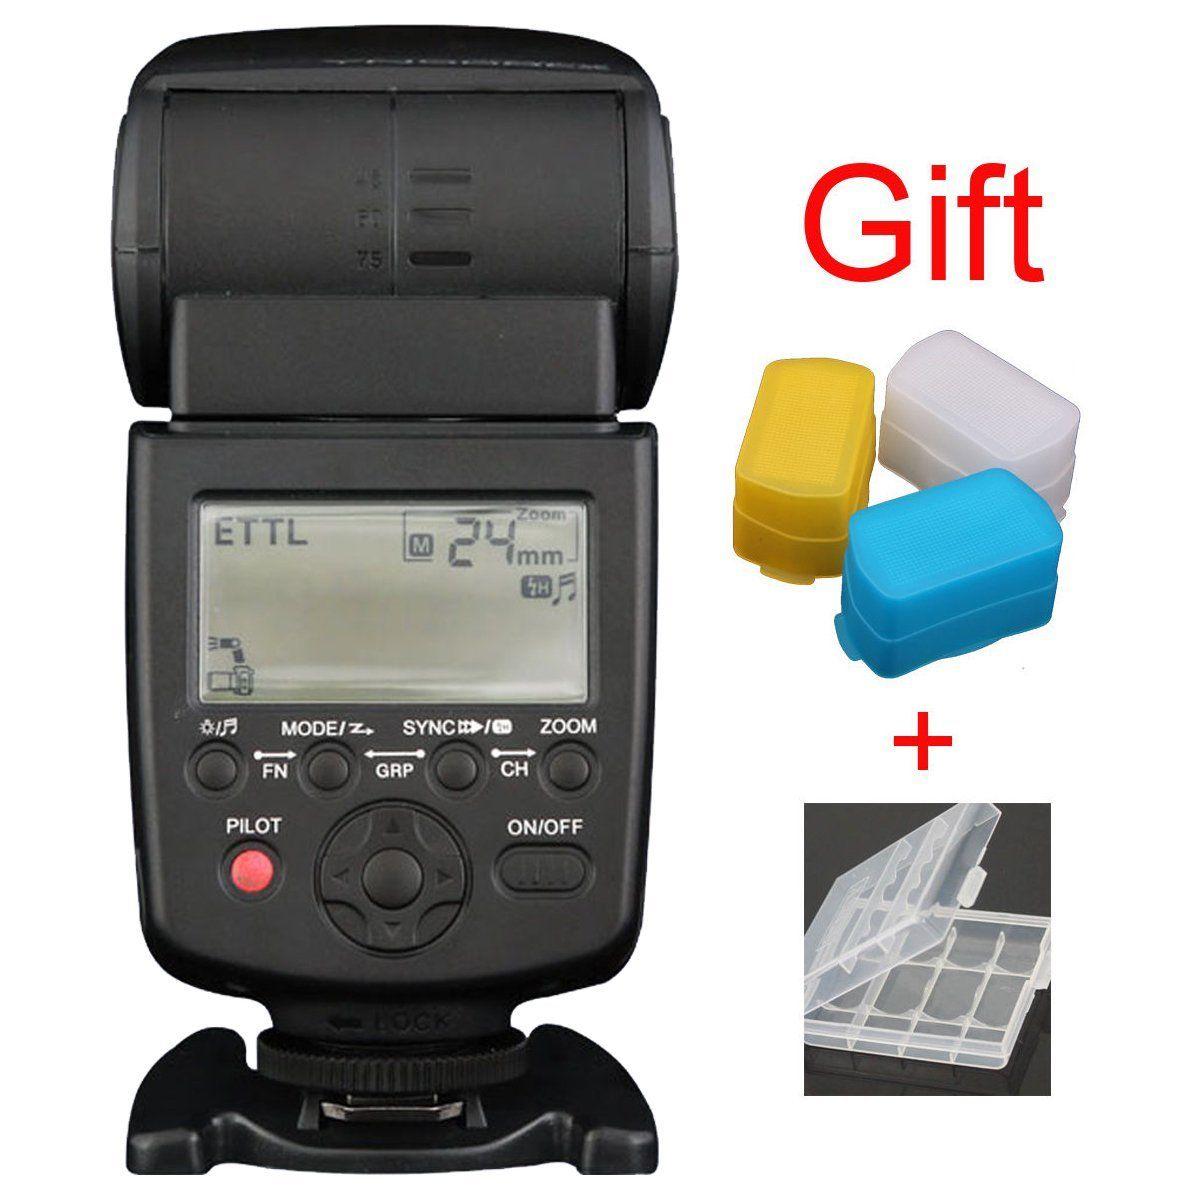 Yongnuo YN 568EX YN 568 EX Беспроводной ведомого TTL Вспышка Speedlite для Nikon D7100 D7000 D5200 D5100 D5000 D3200 D3100